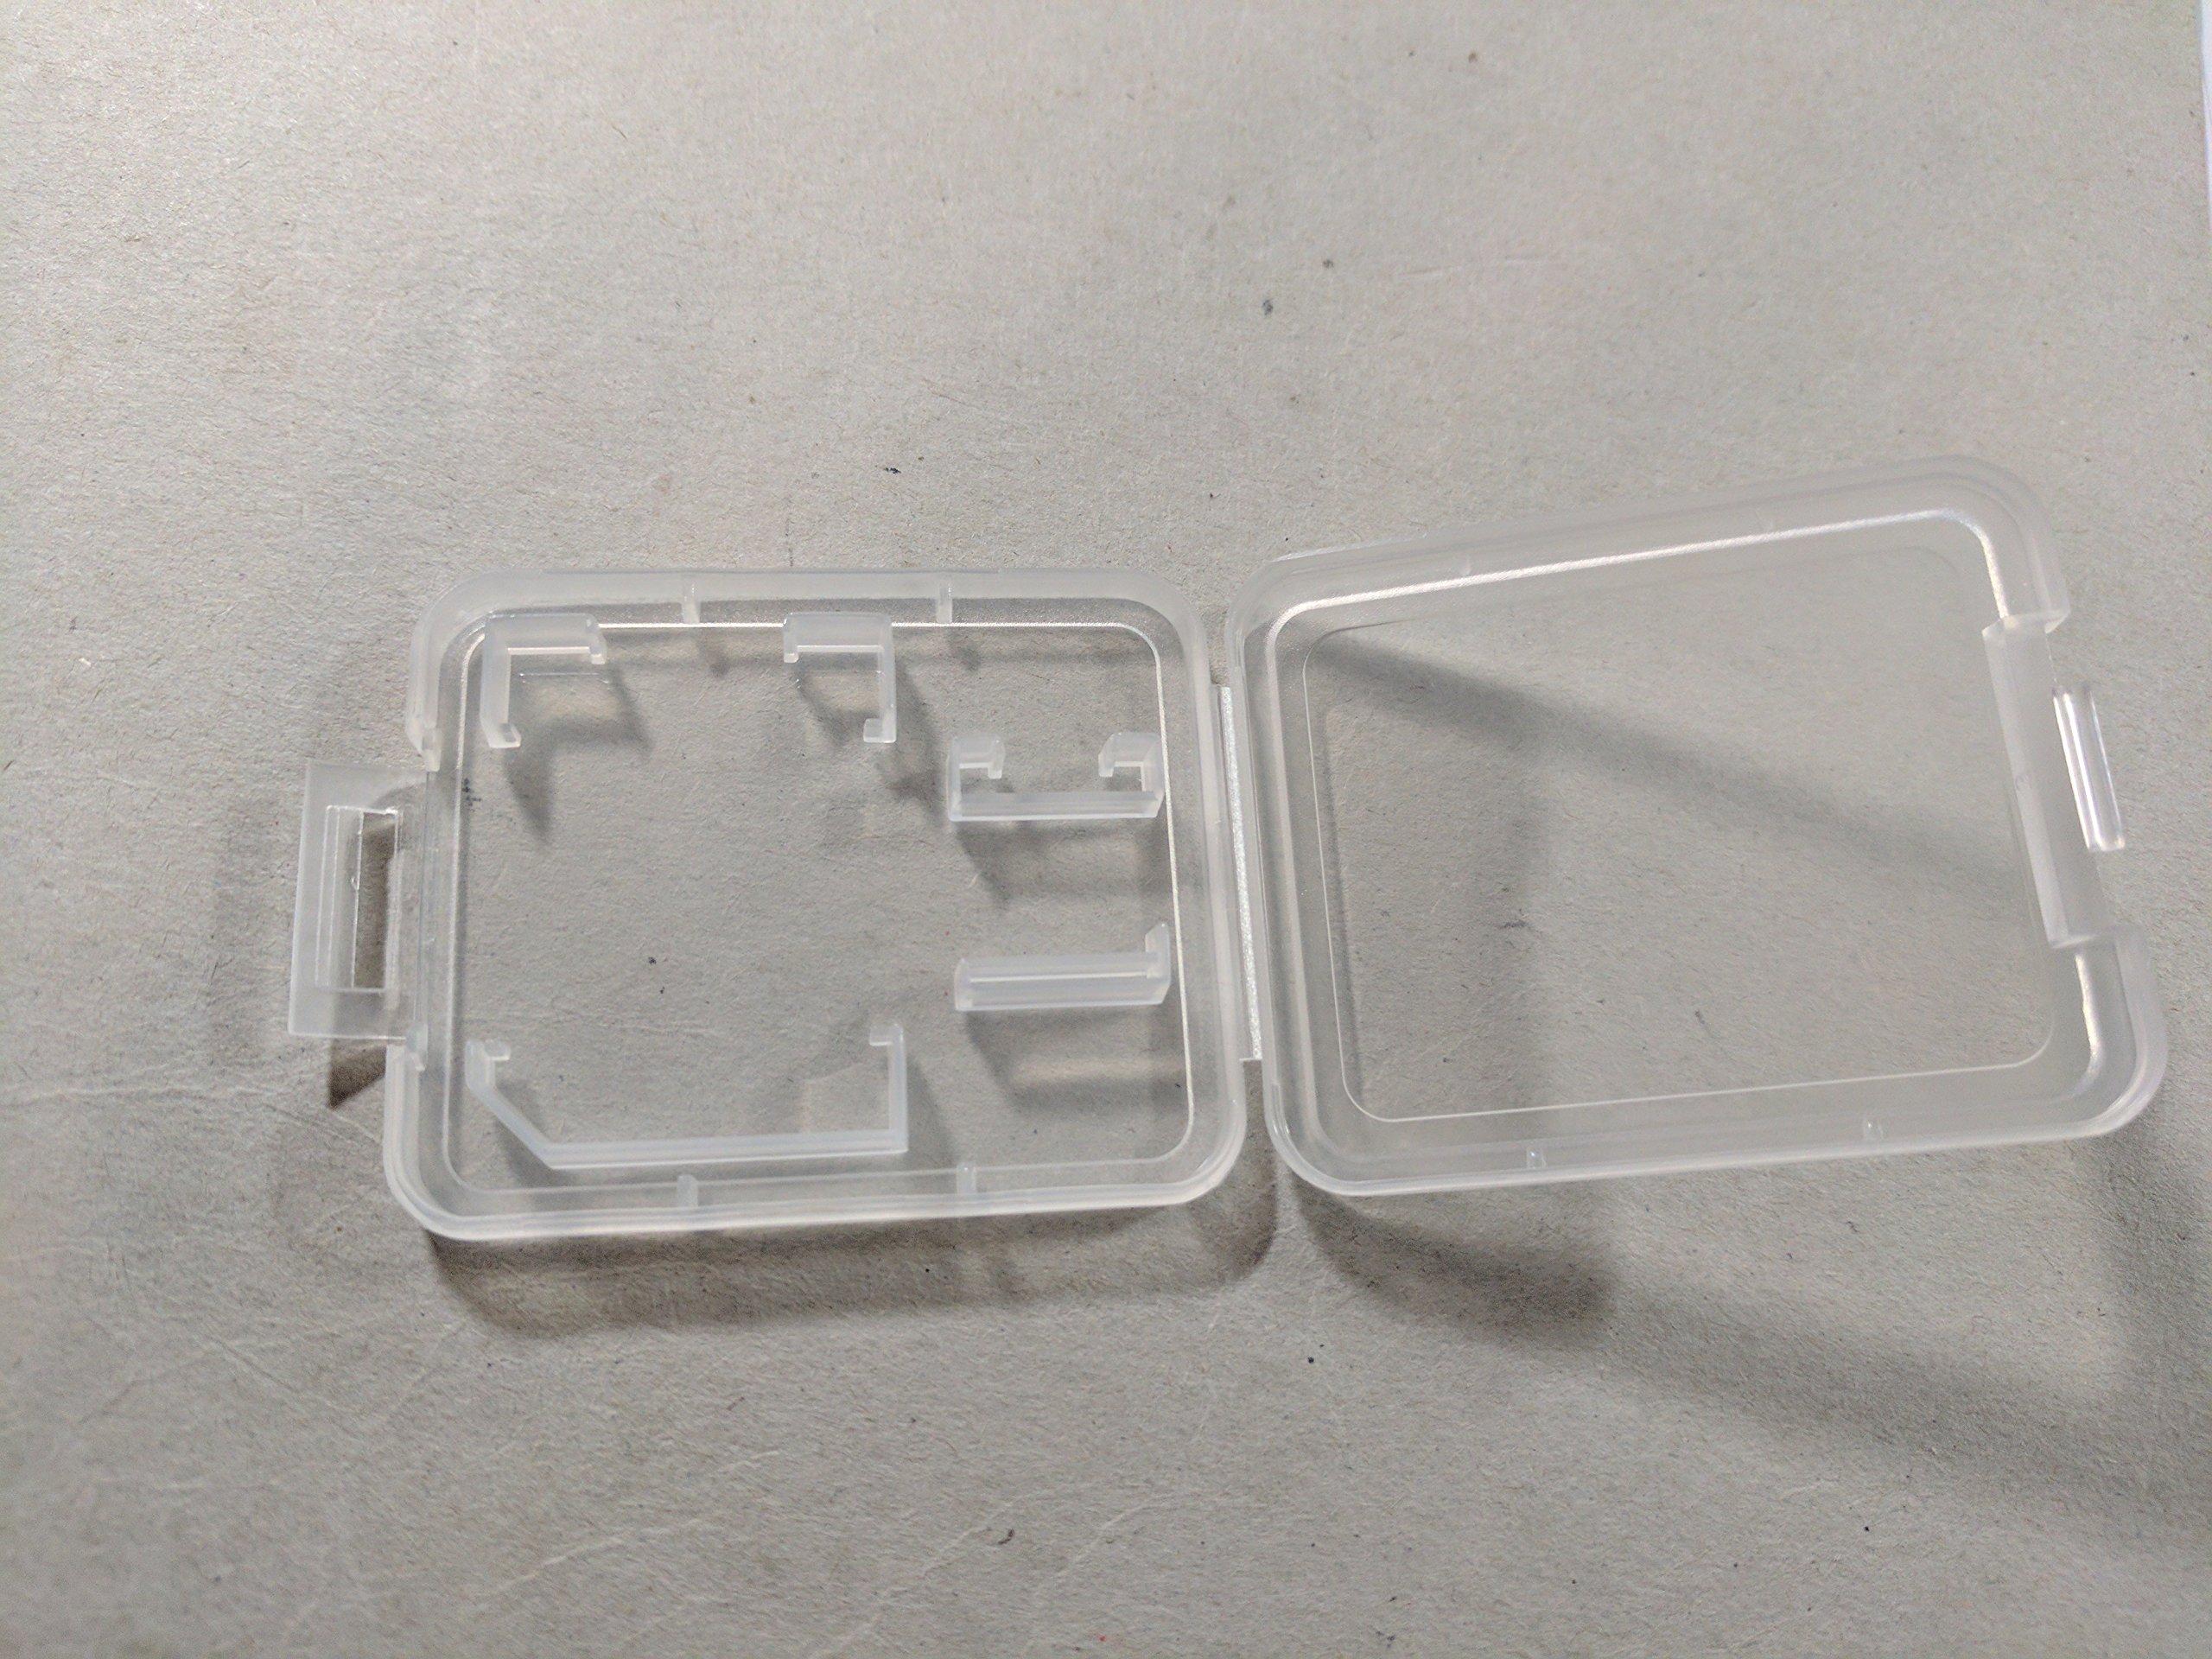 eTECH Collection 200 Pack of Clear Plastic SD/SDHC/SDXC/MicroSD/MicroSDHC/MicroSDXC Memory Card Case Holder for SanDisk/Kingston/Transcend/Samsung Memory Card (Case Only, Memory Card Not Included)